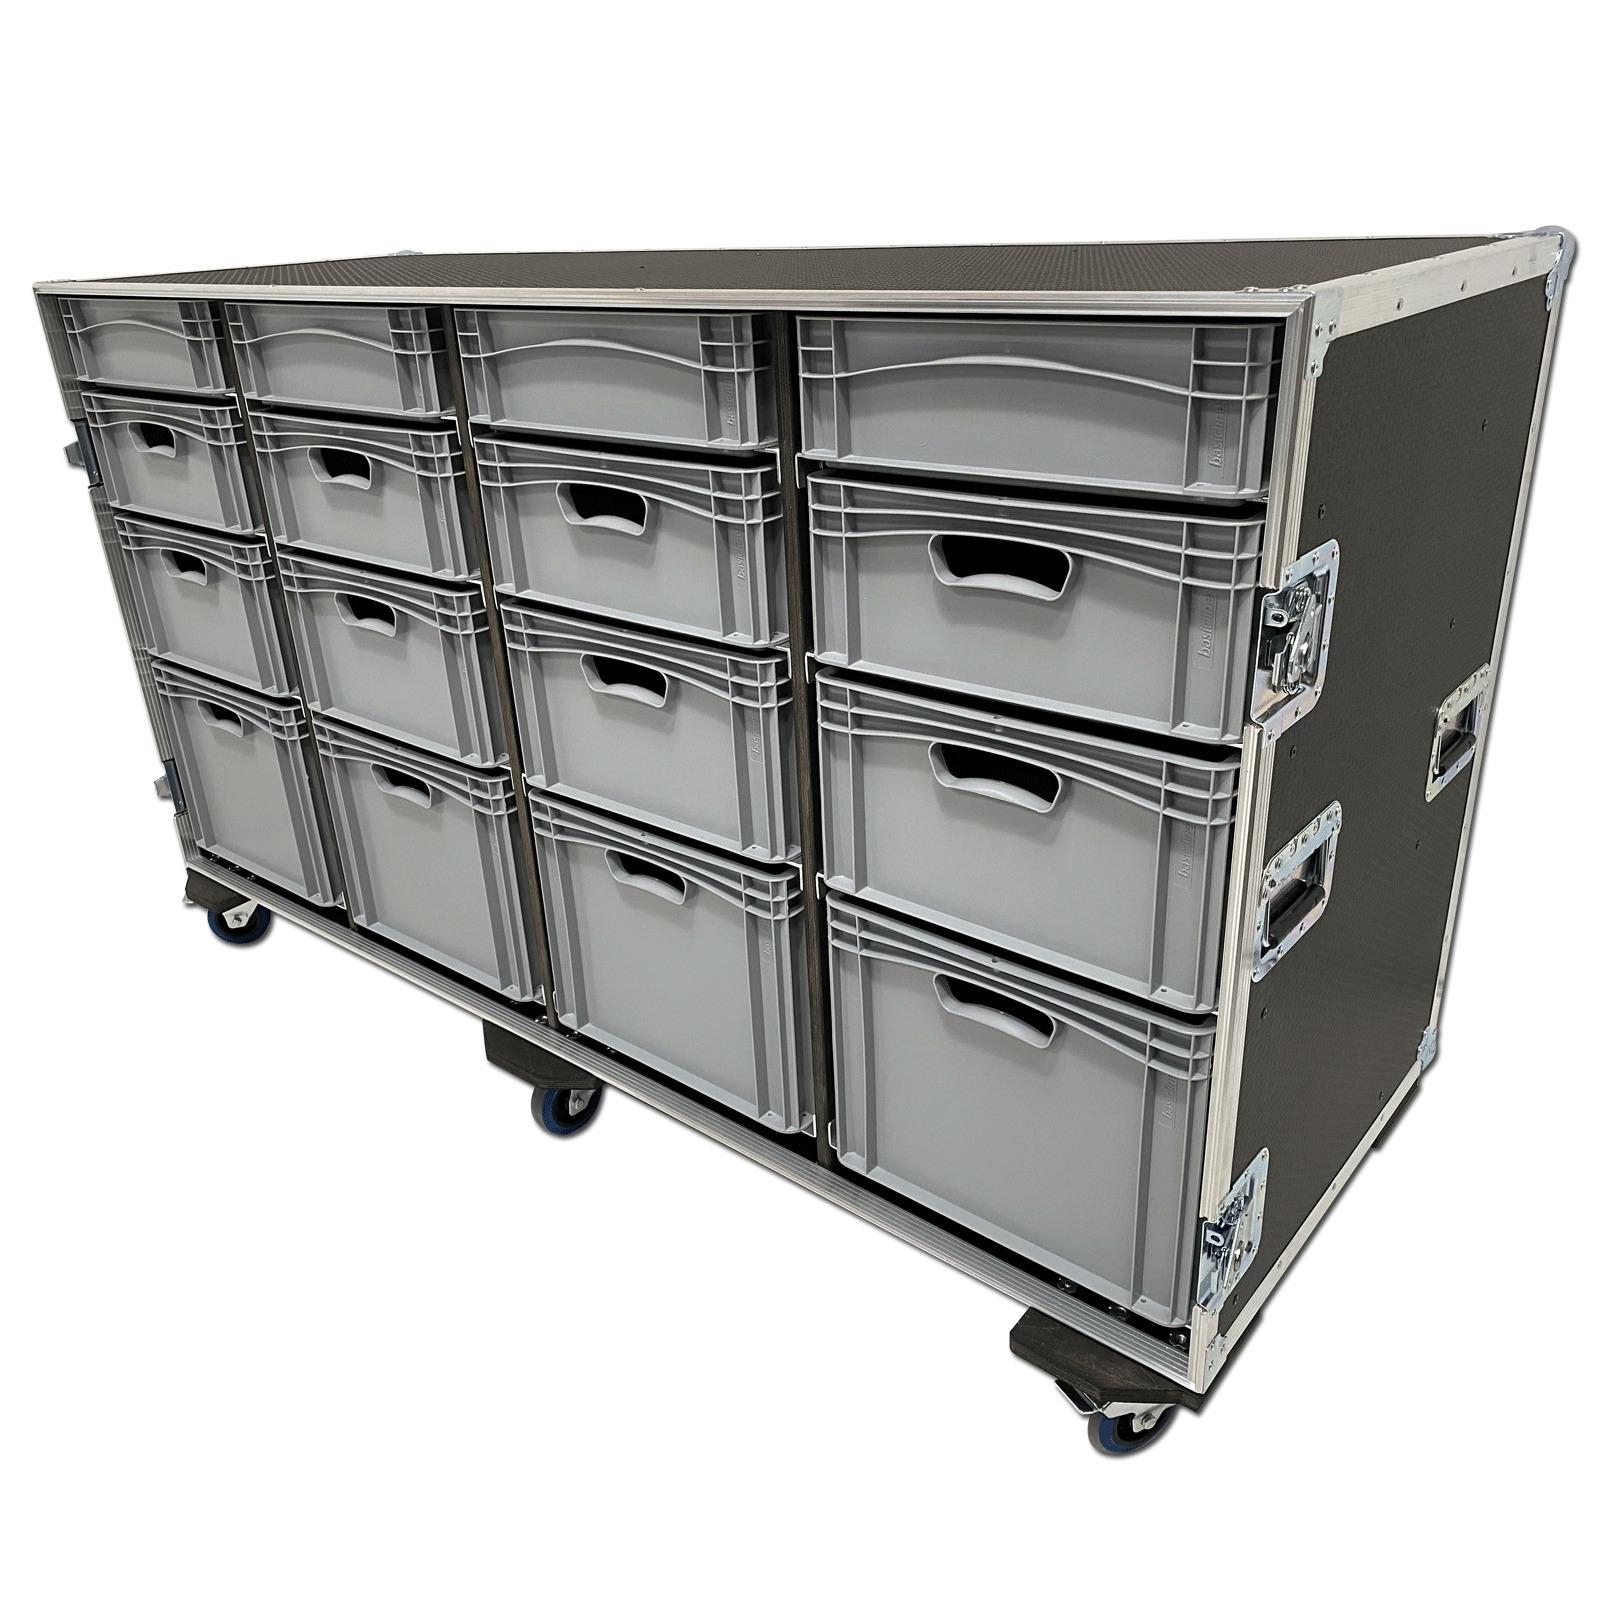 Product Portable Storage : Portable garage storage flight case